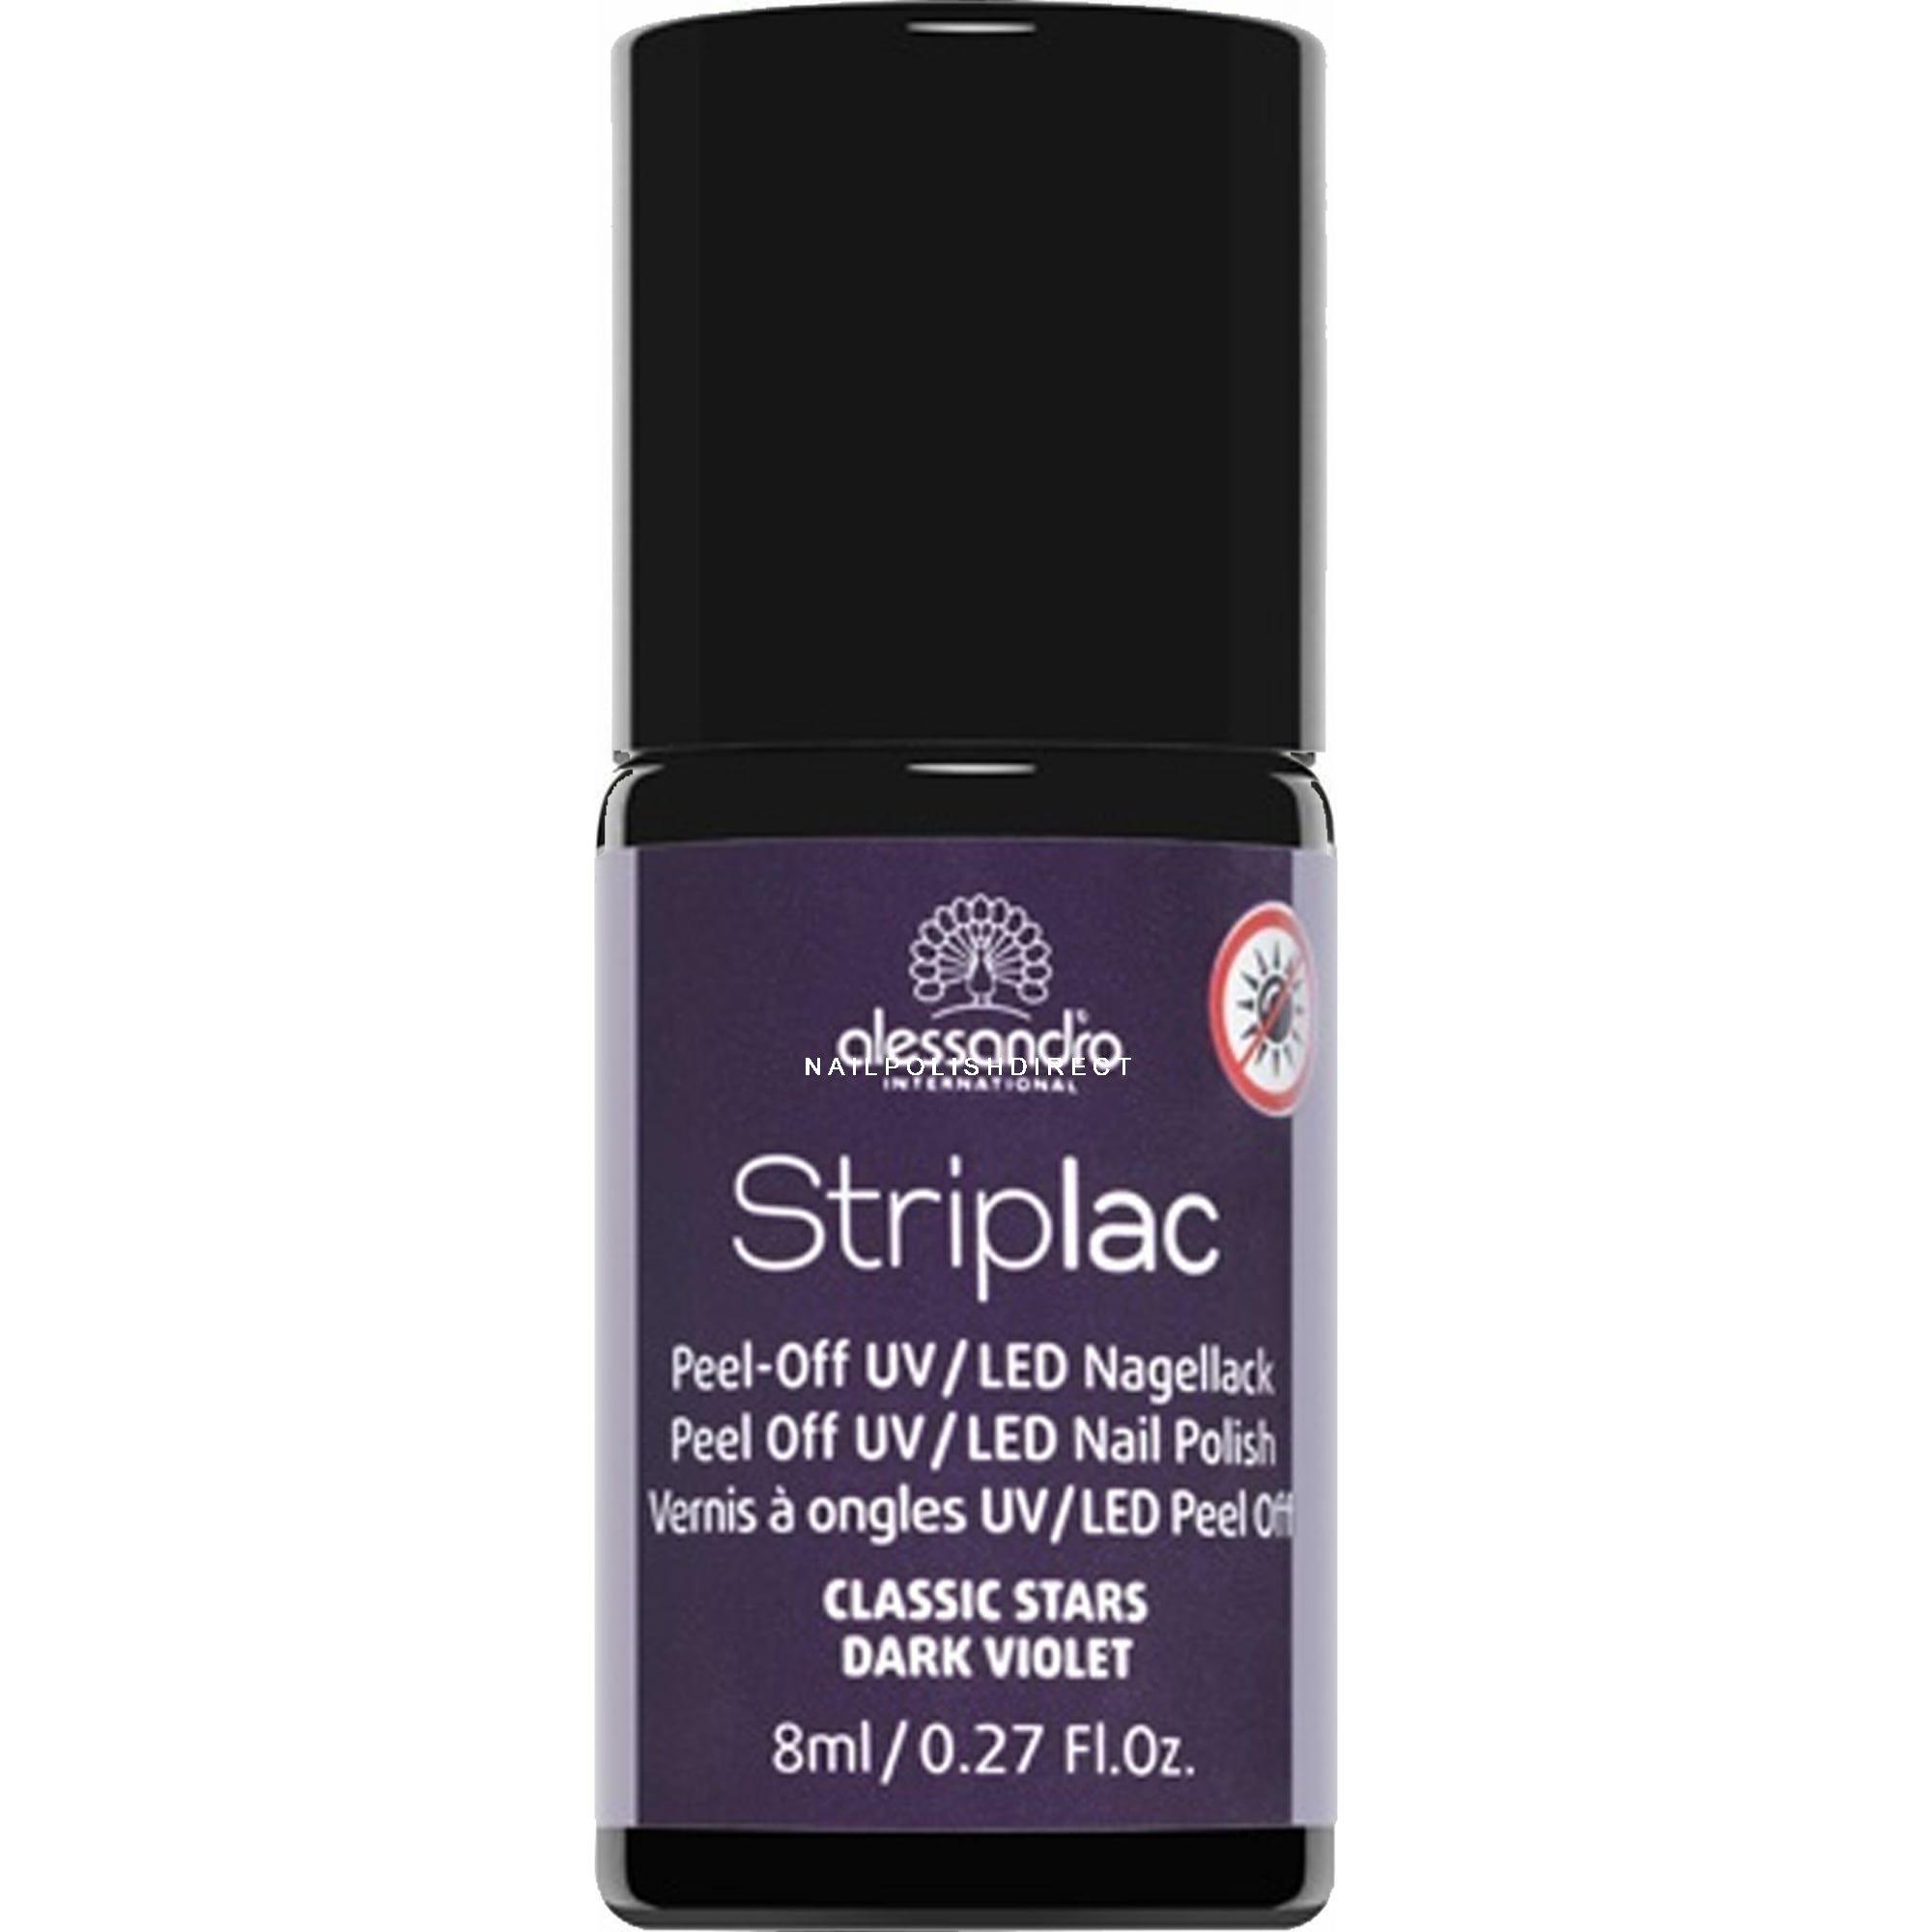 Striplac Peel Off UV LED Nail Polish - Dark Violet (45)